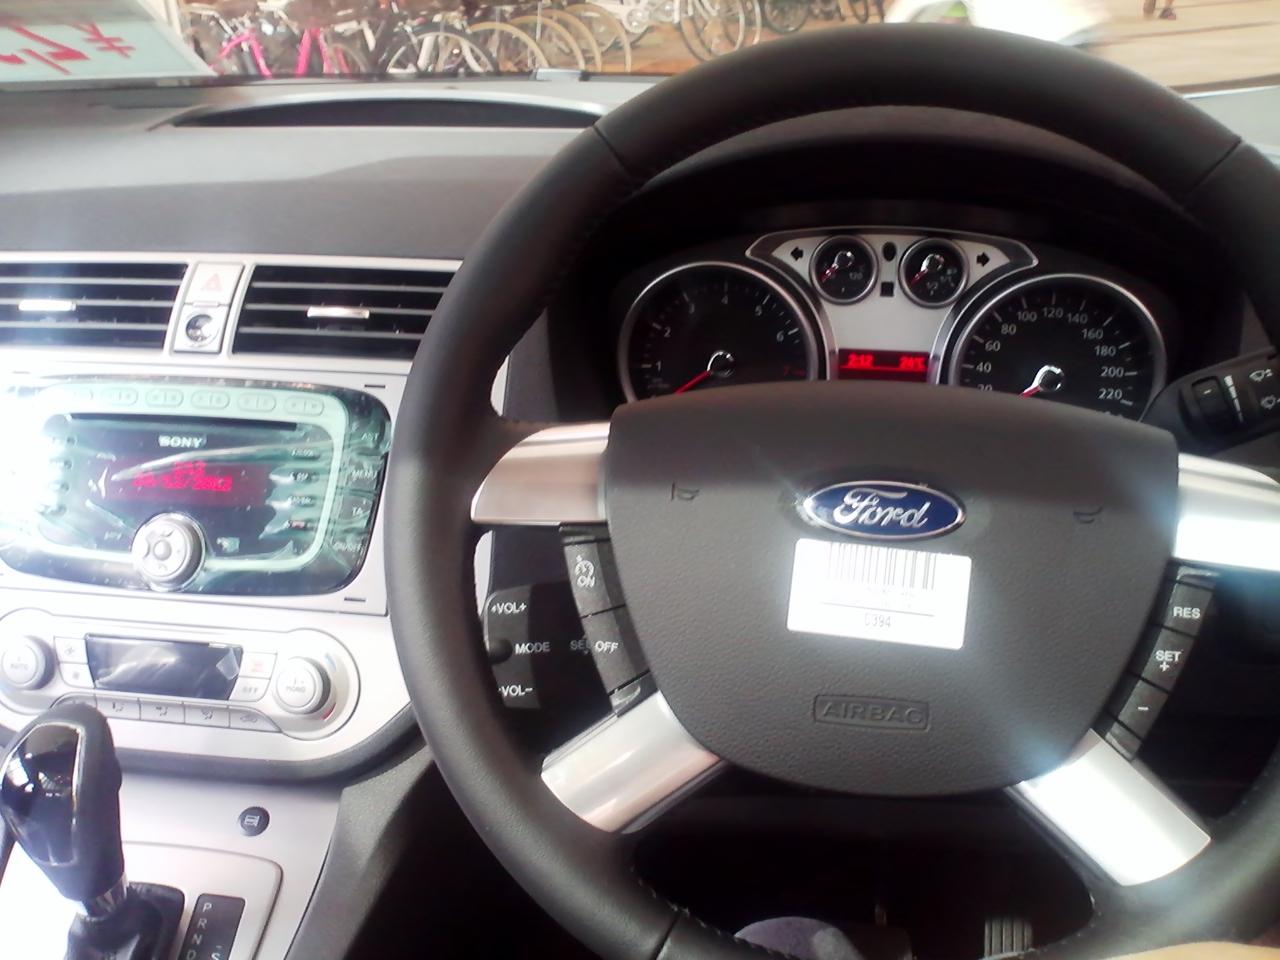 File:1st Ford Kuga interior.jpg - Wikimedia Commons